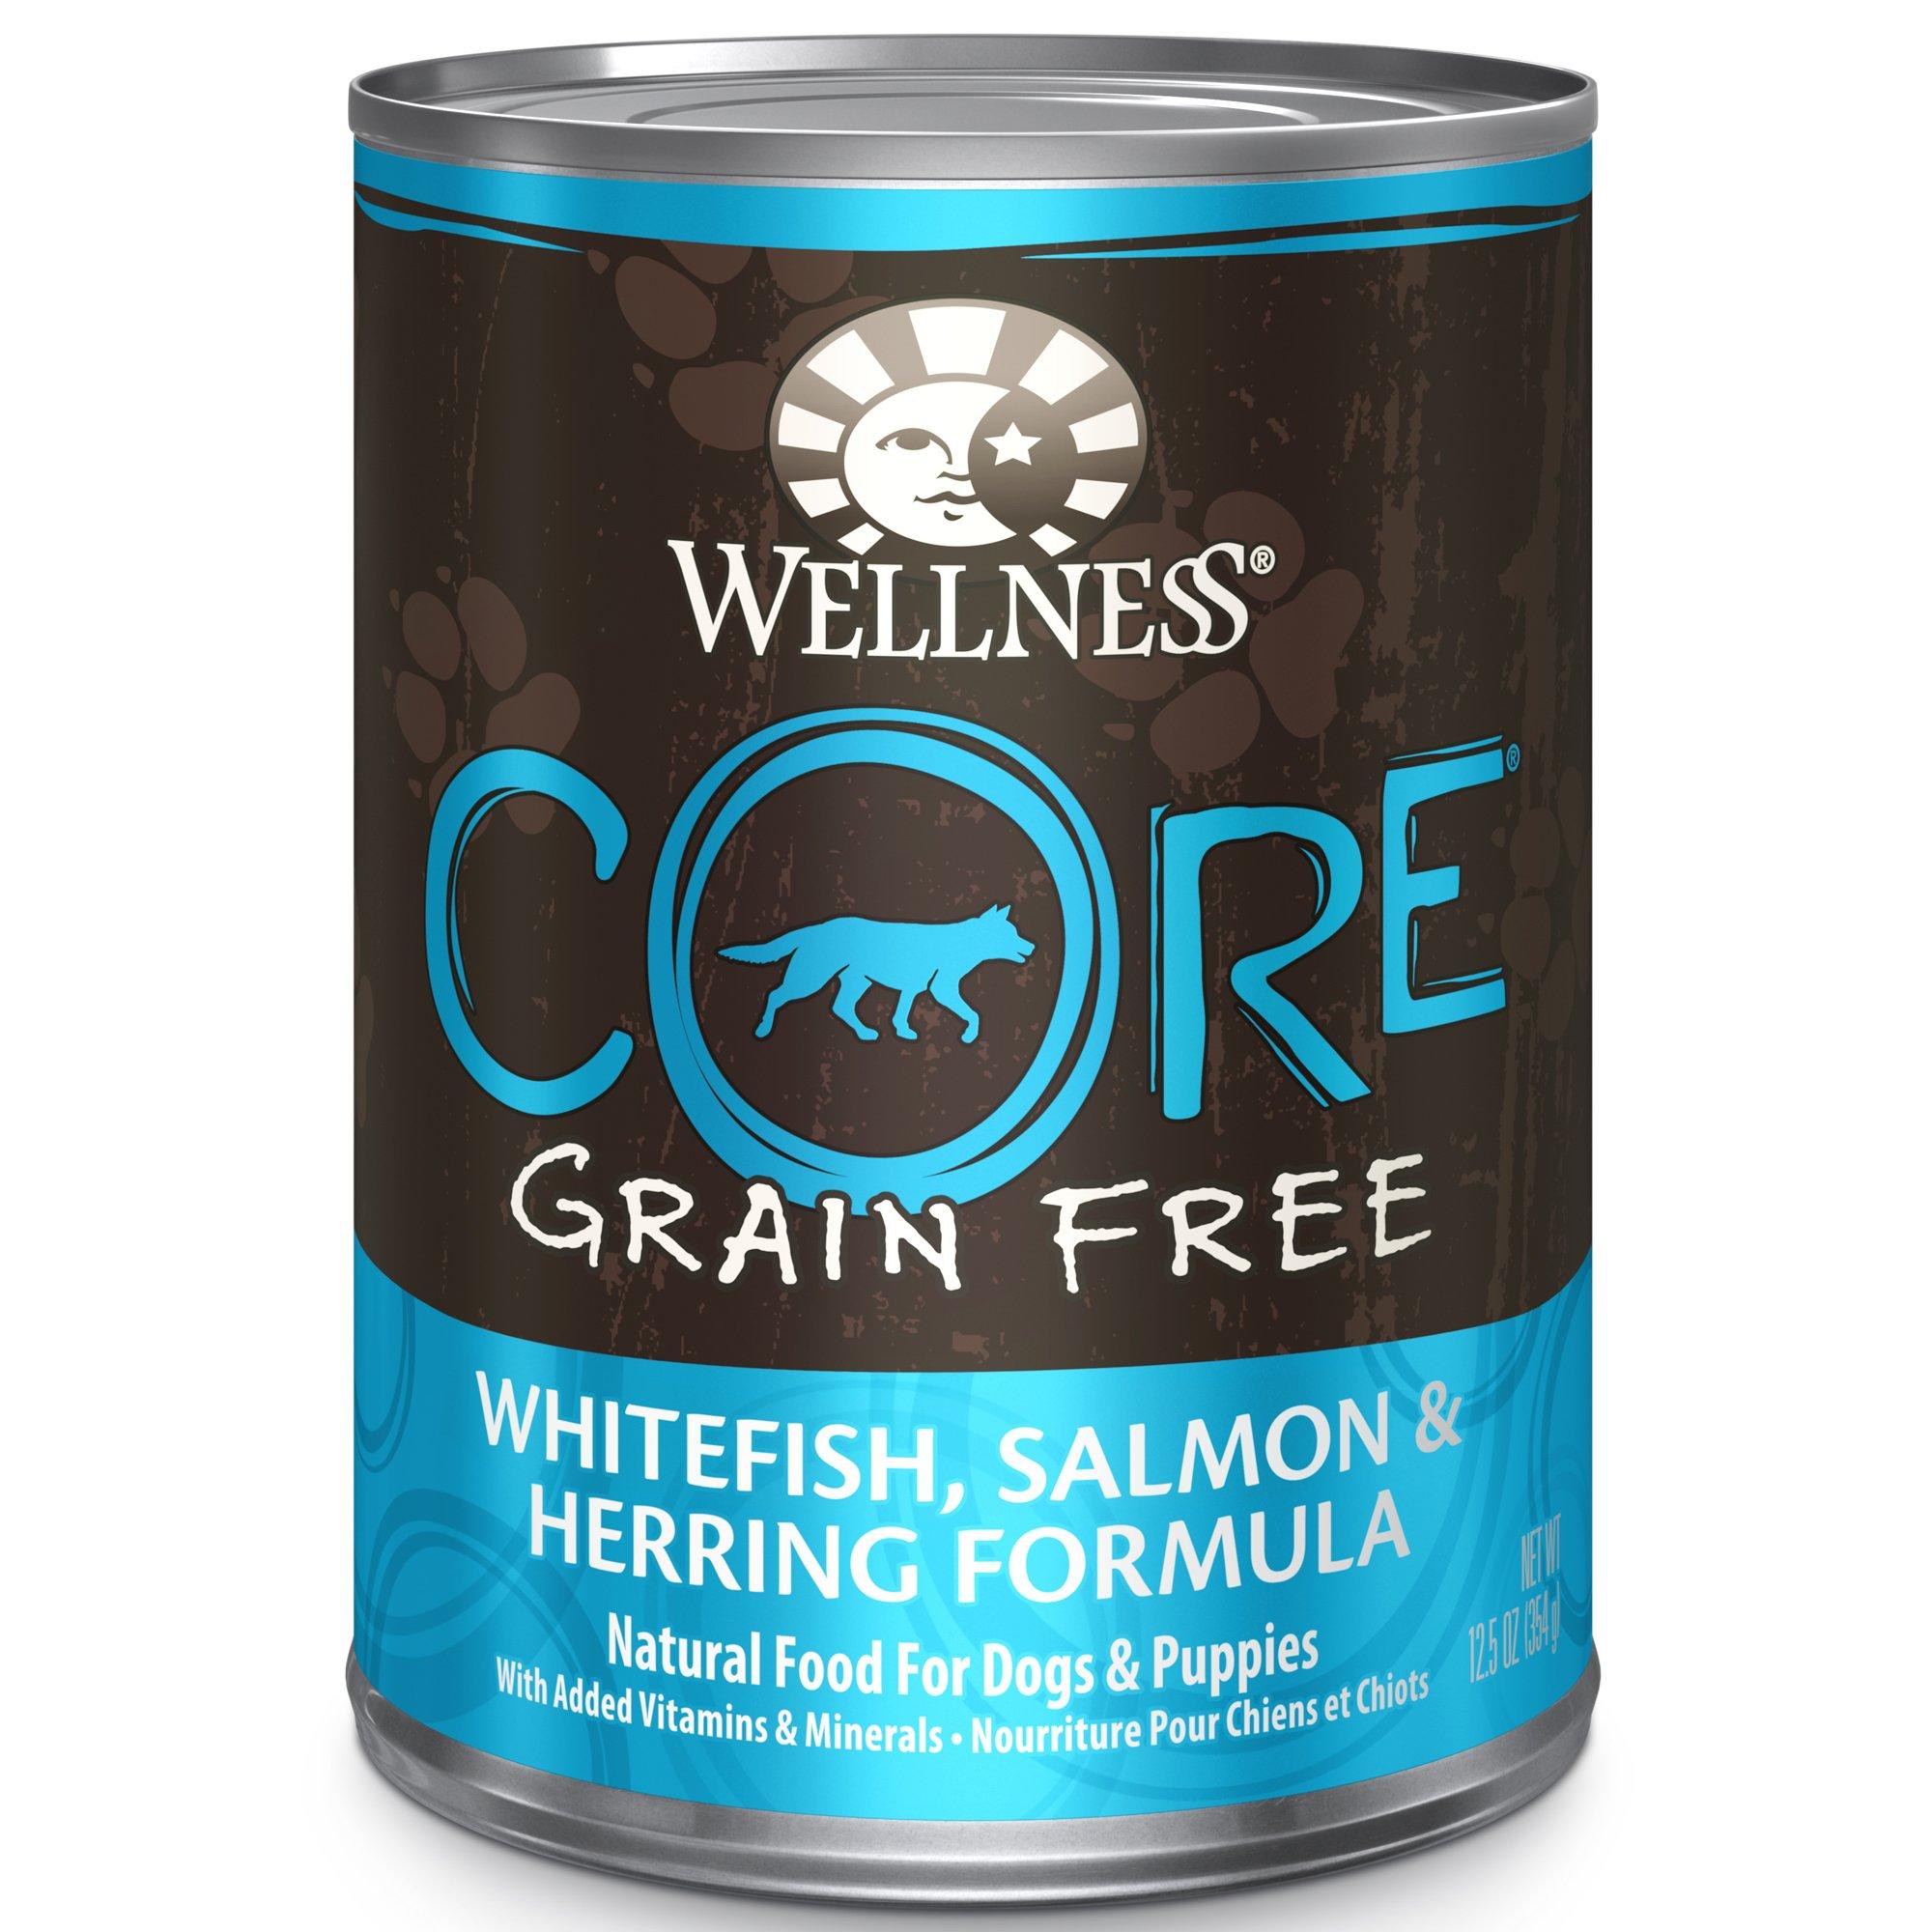 Wellness Canned Dog Food Whitefish Herring